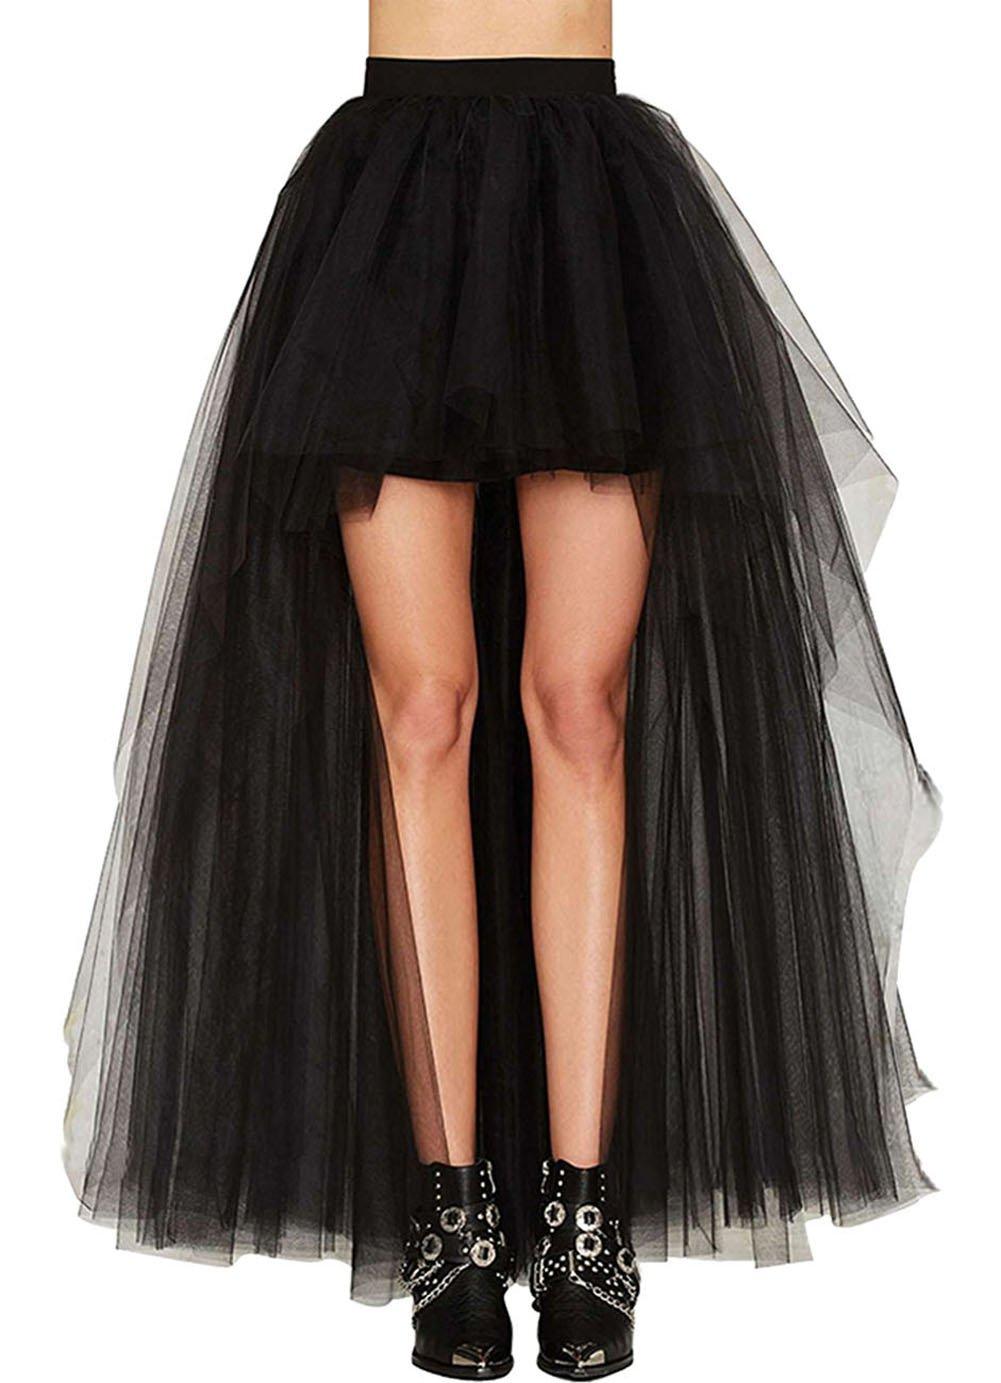 COSWE Womens Lace Asymmetrical High Waist Swallowtail Skirt